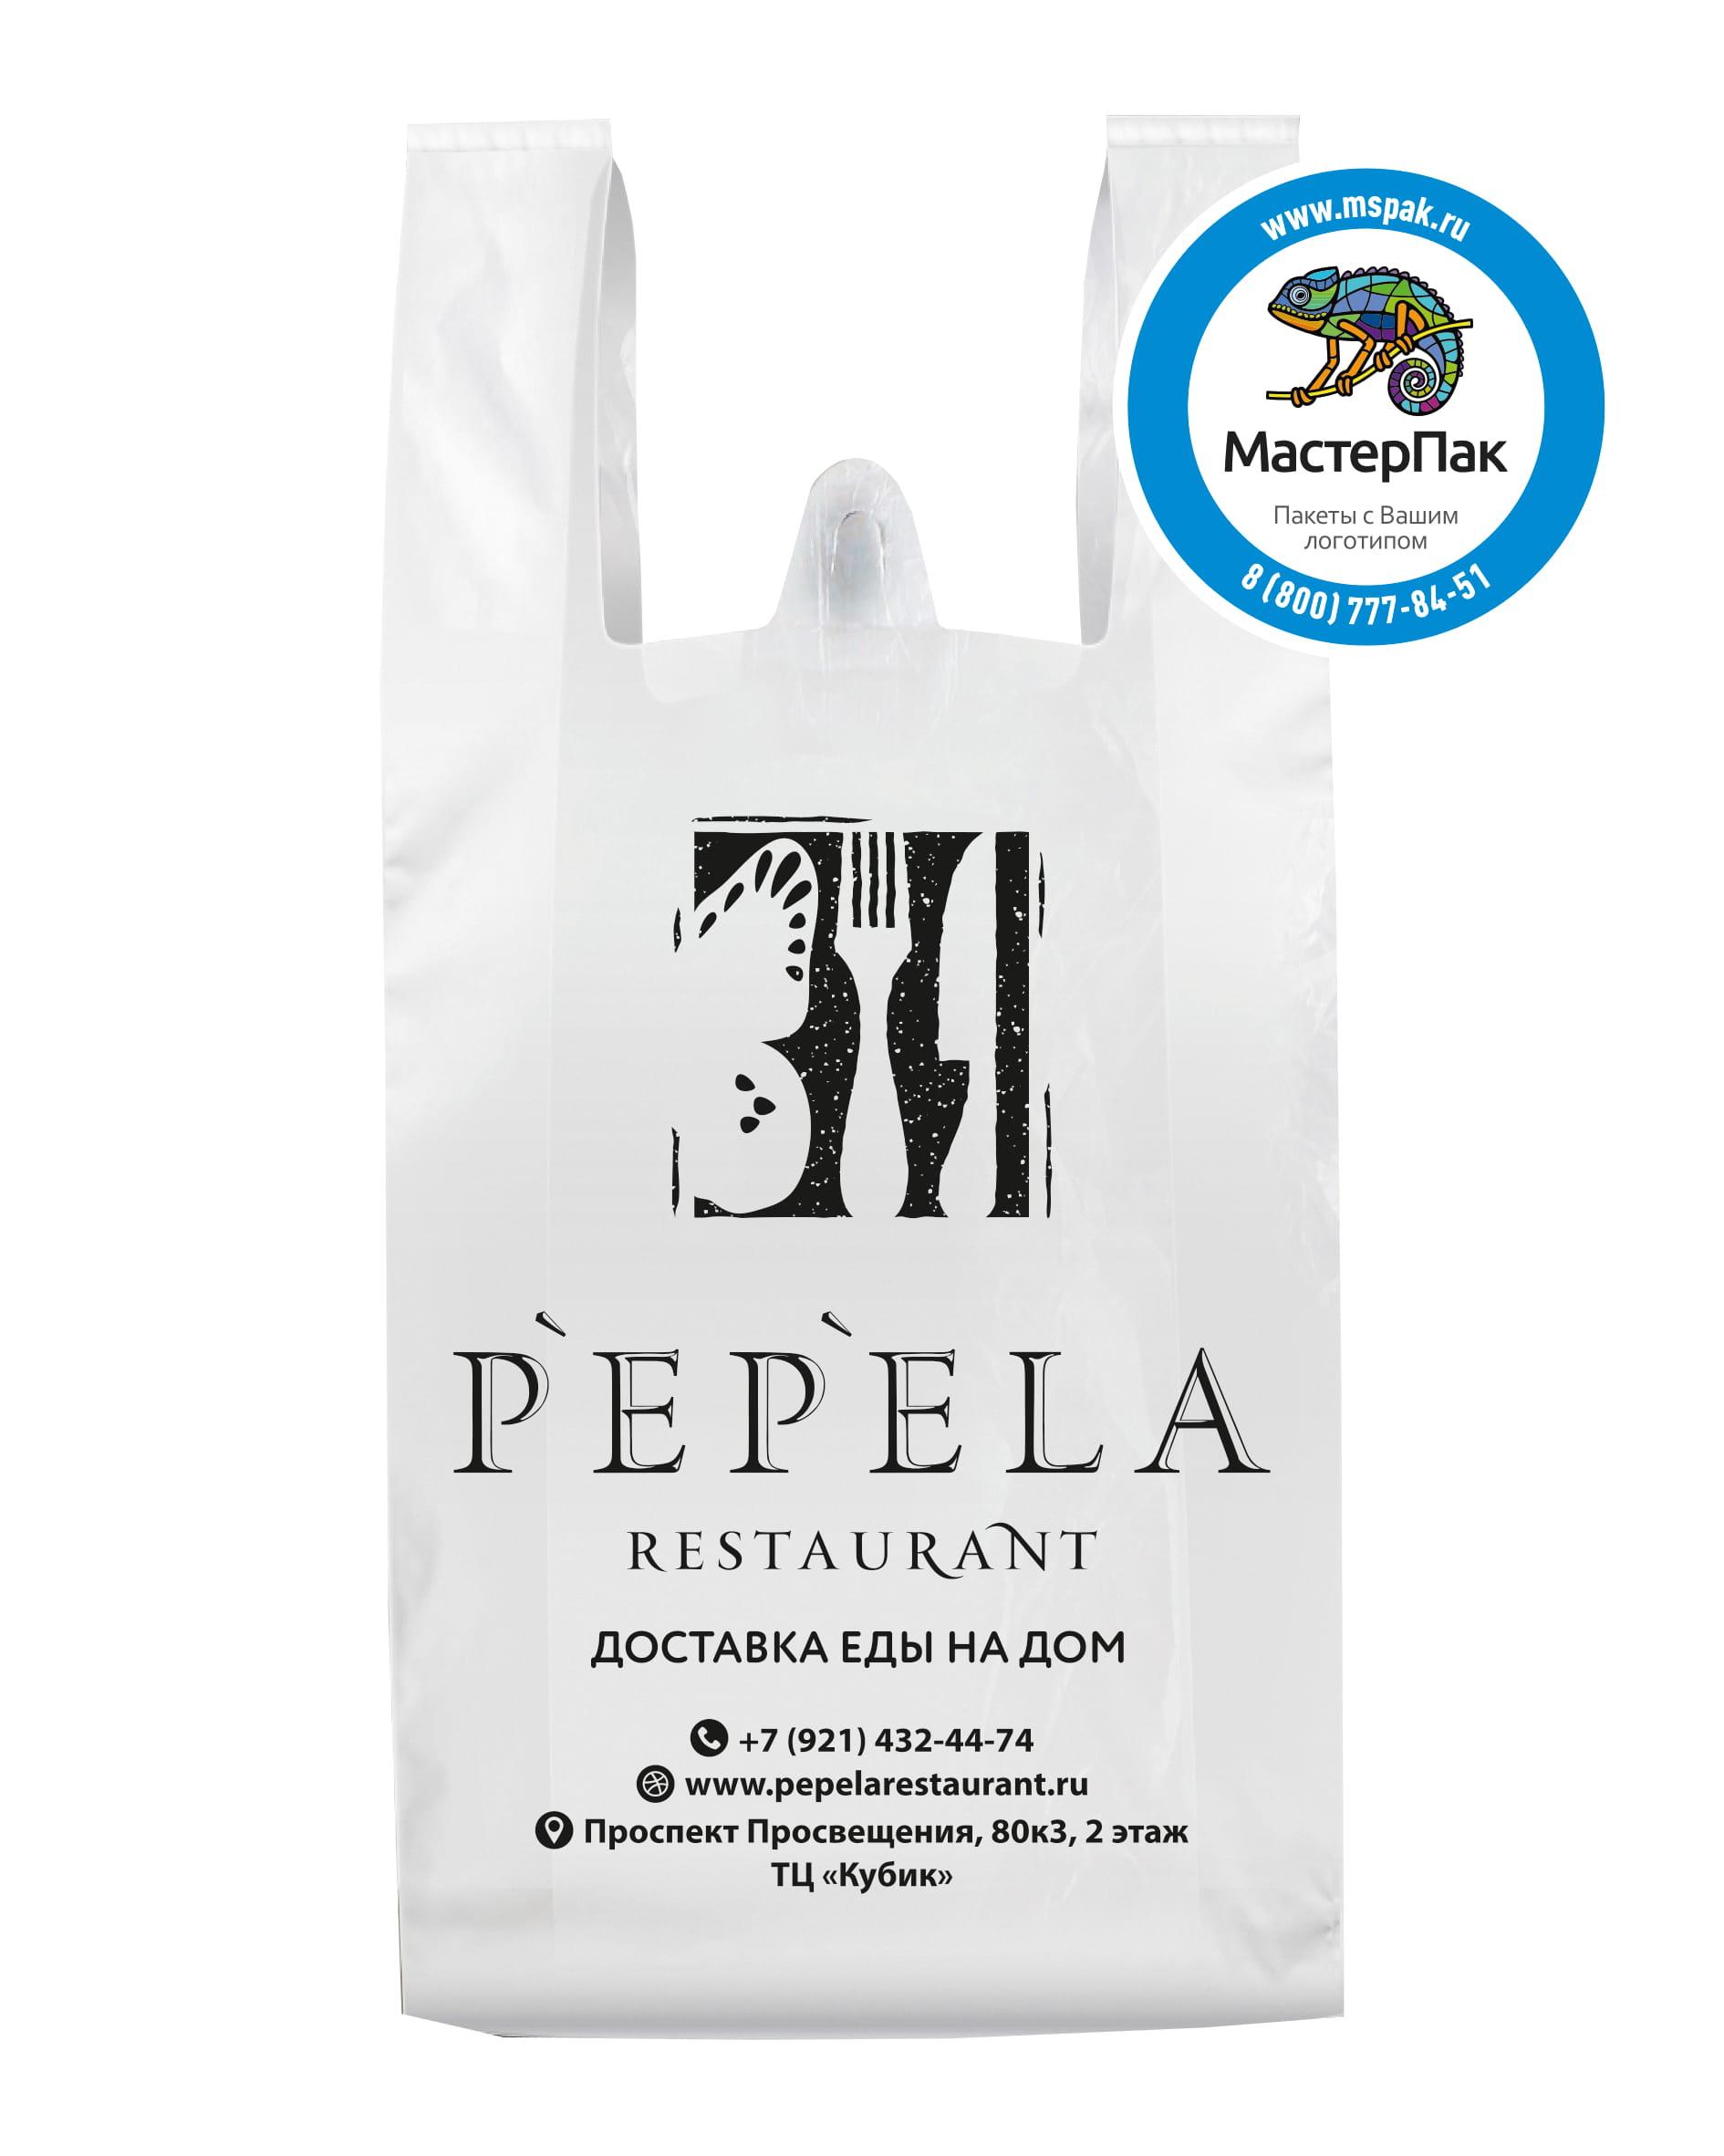 Пакет-майка ПНД, белый, с логотипом ресторана Pepela, 25 мкм, 40*60, Спб